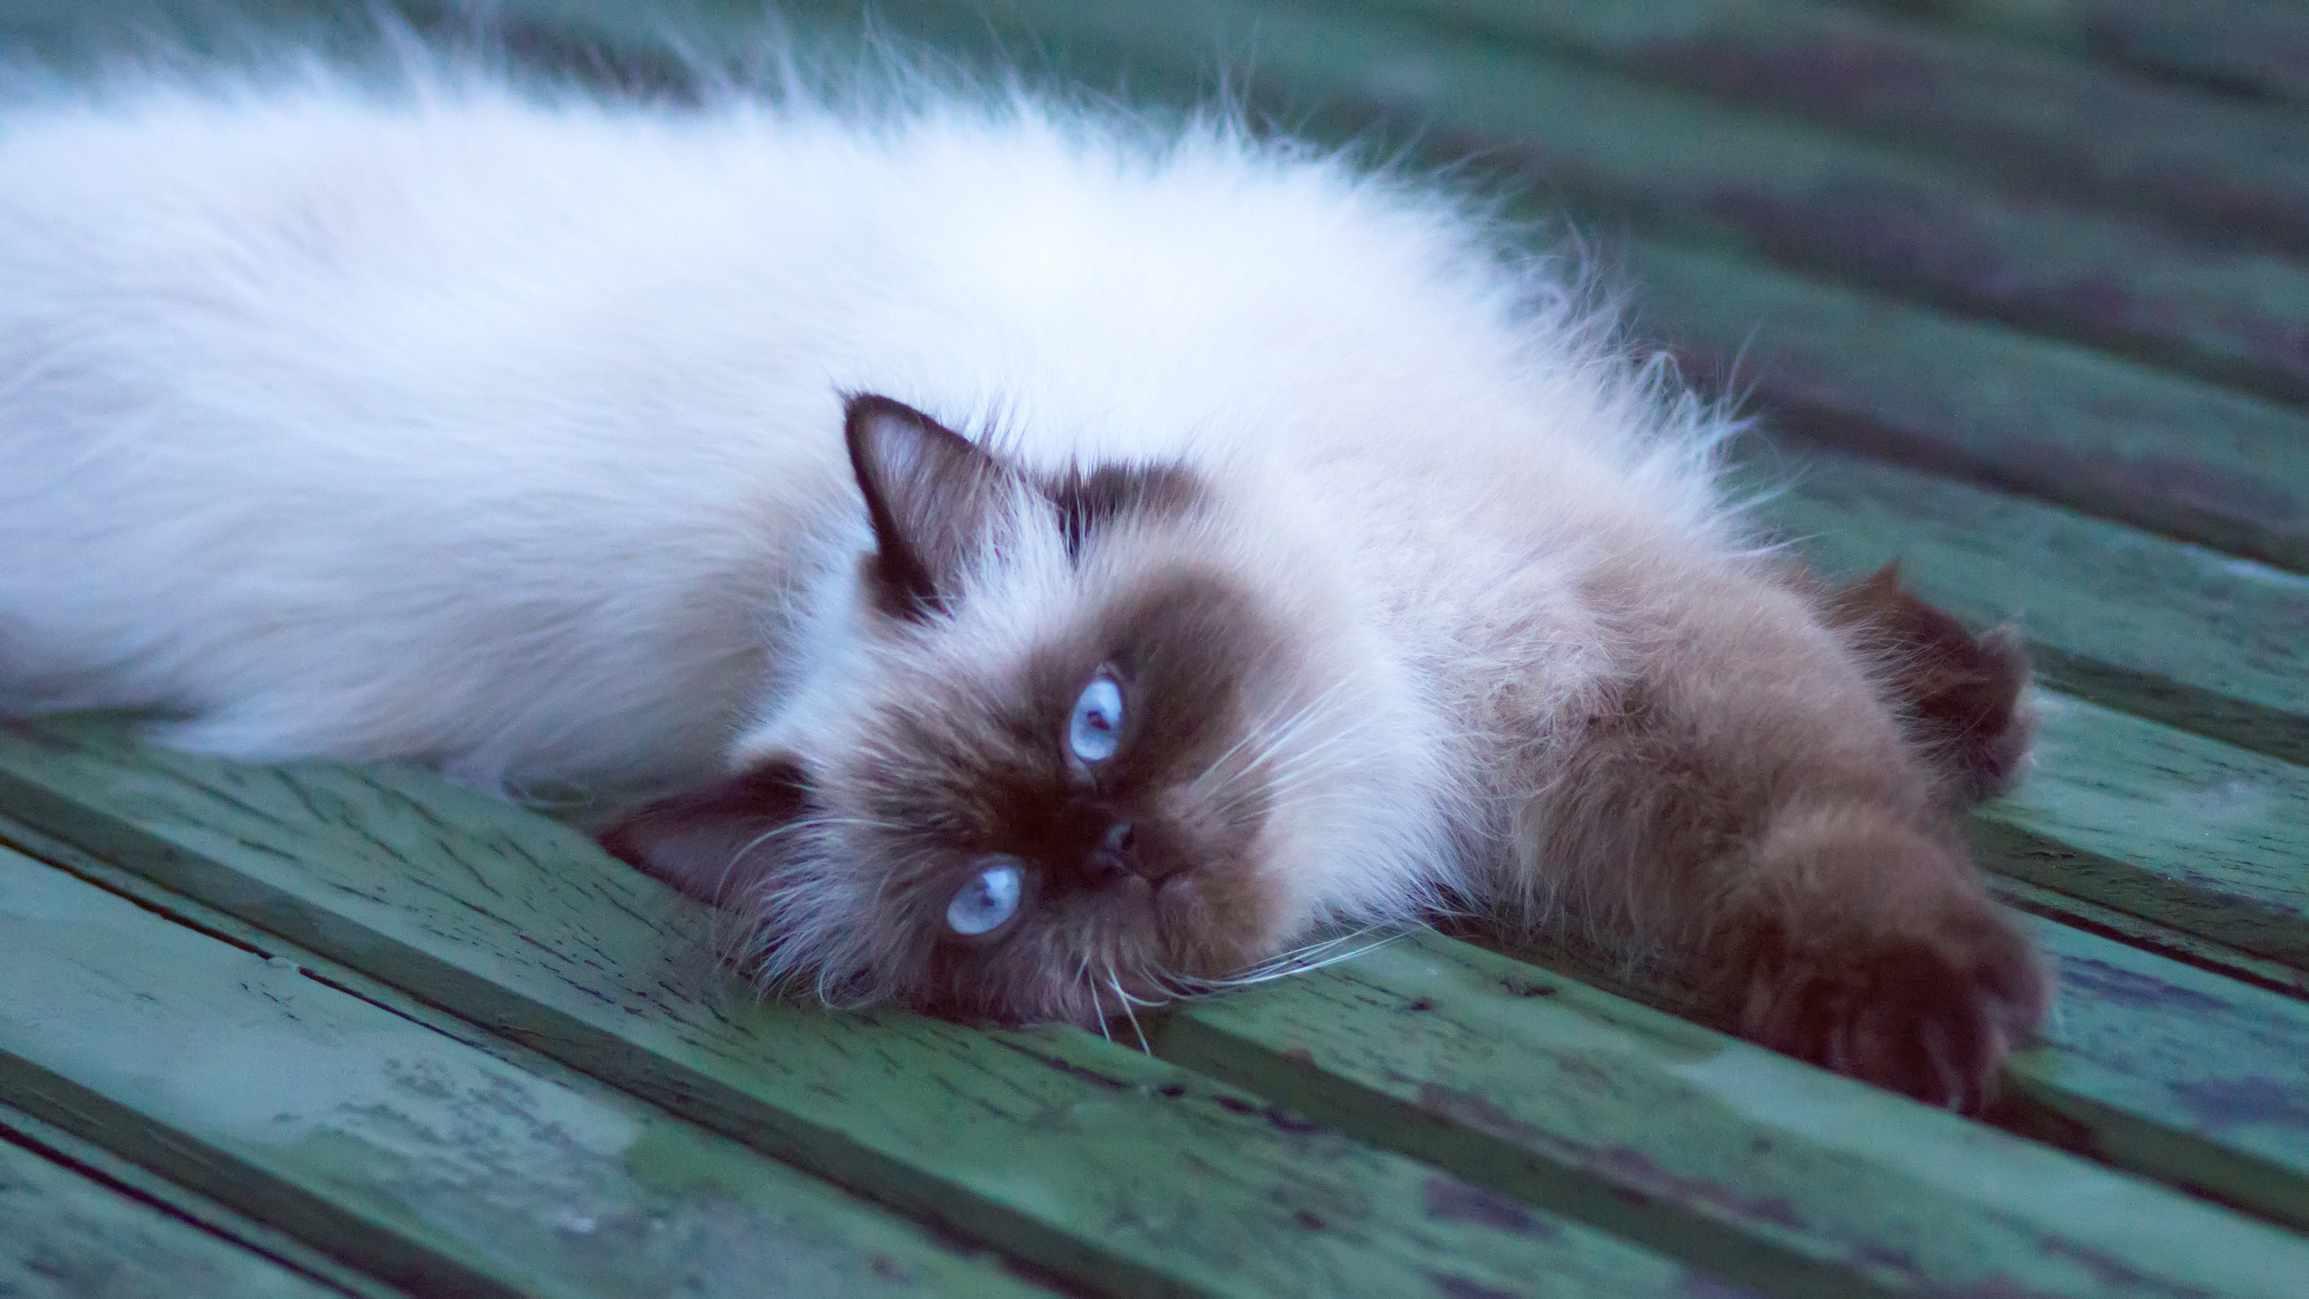 Himalayan cat lying on a green deck